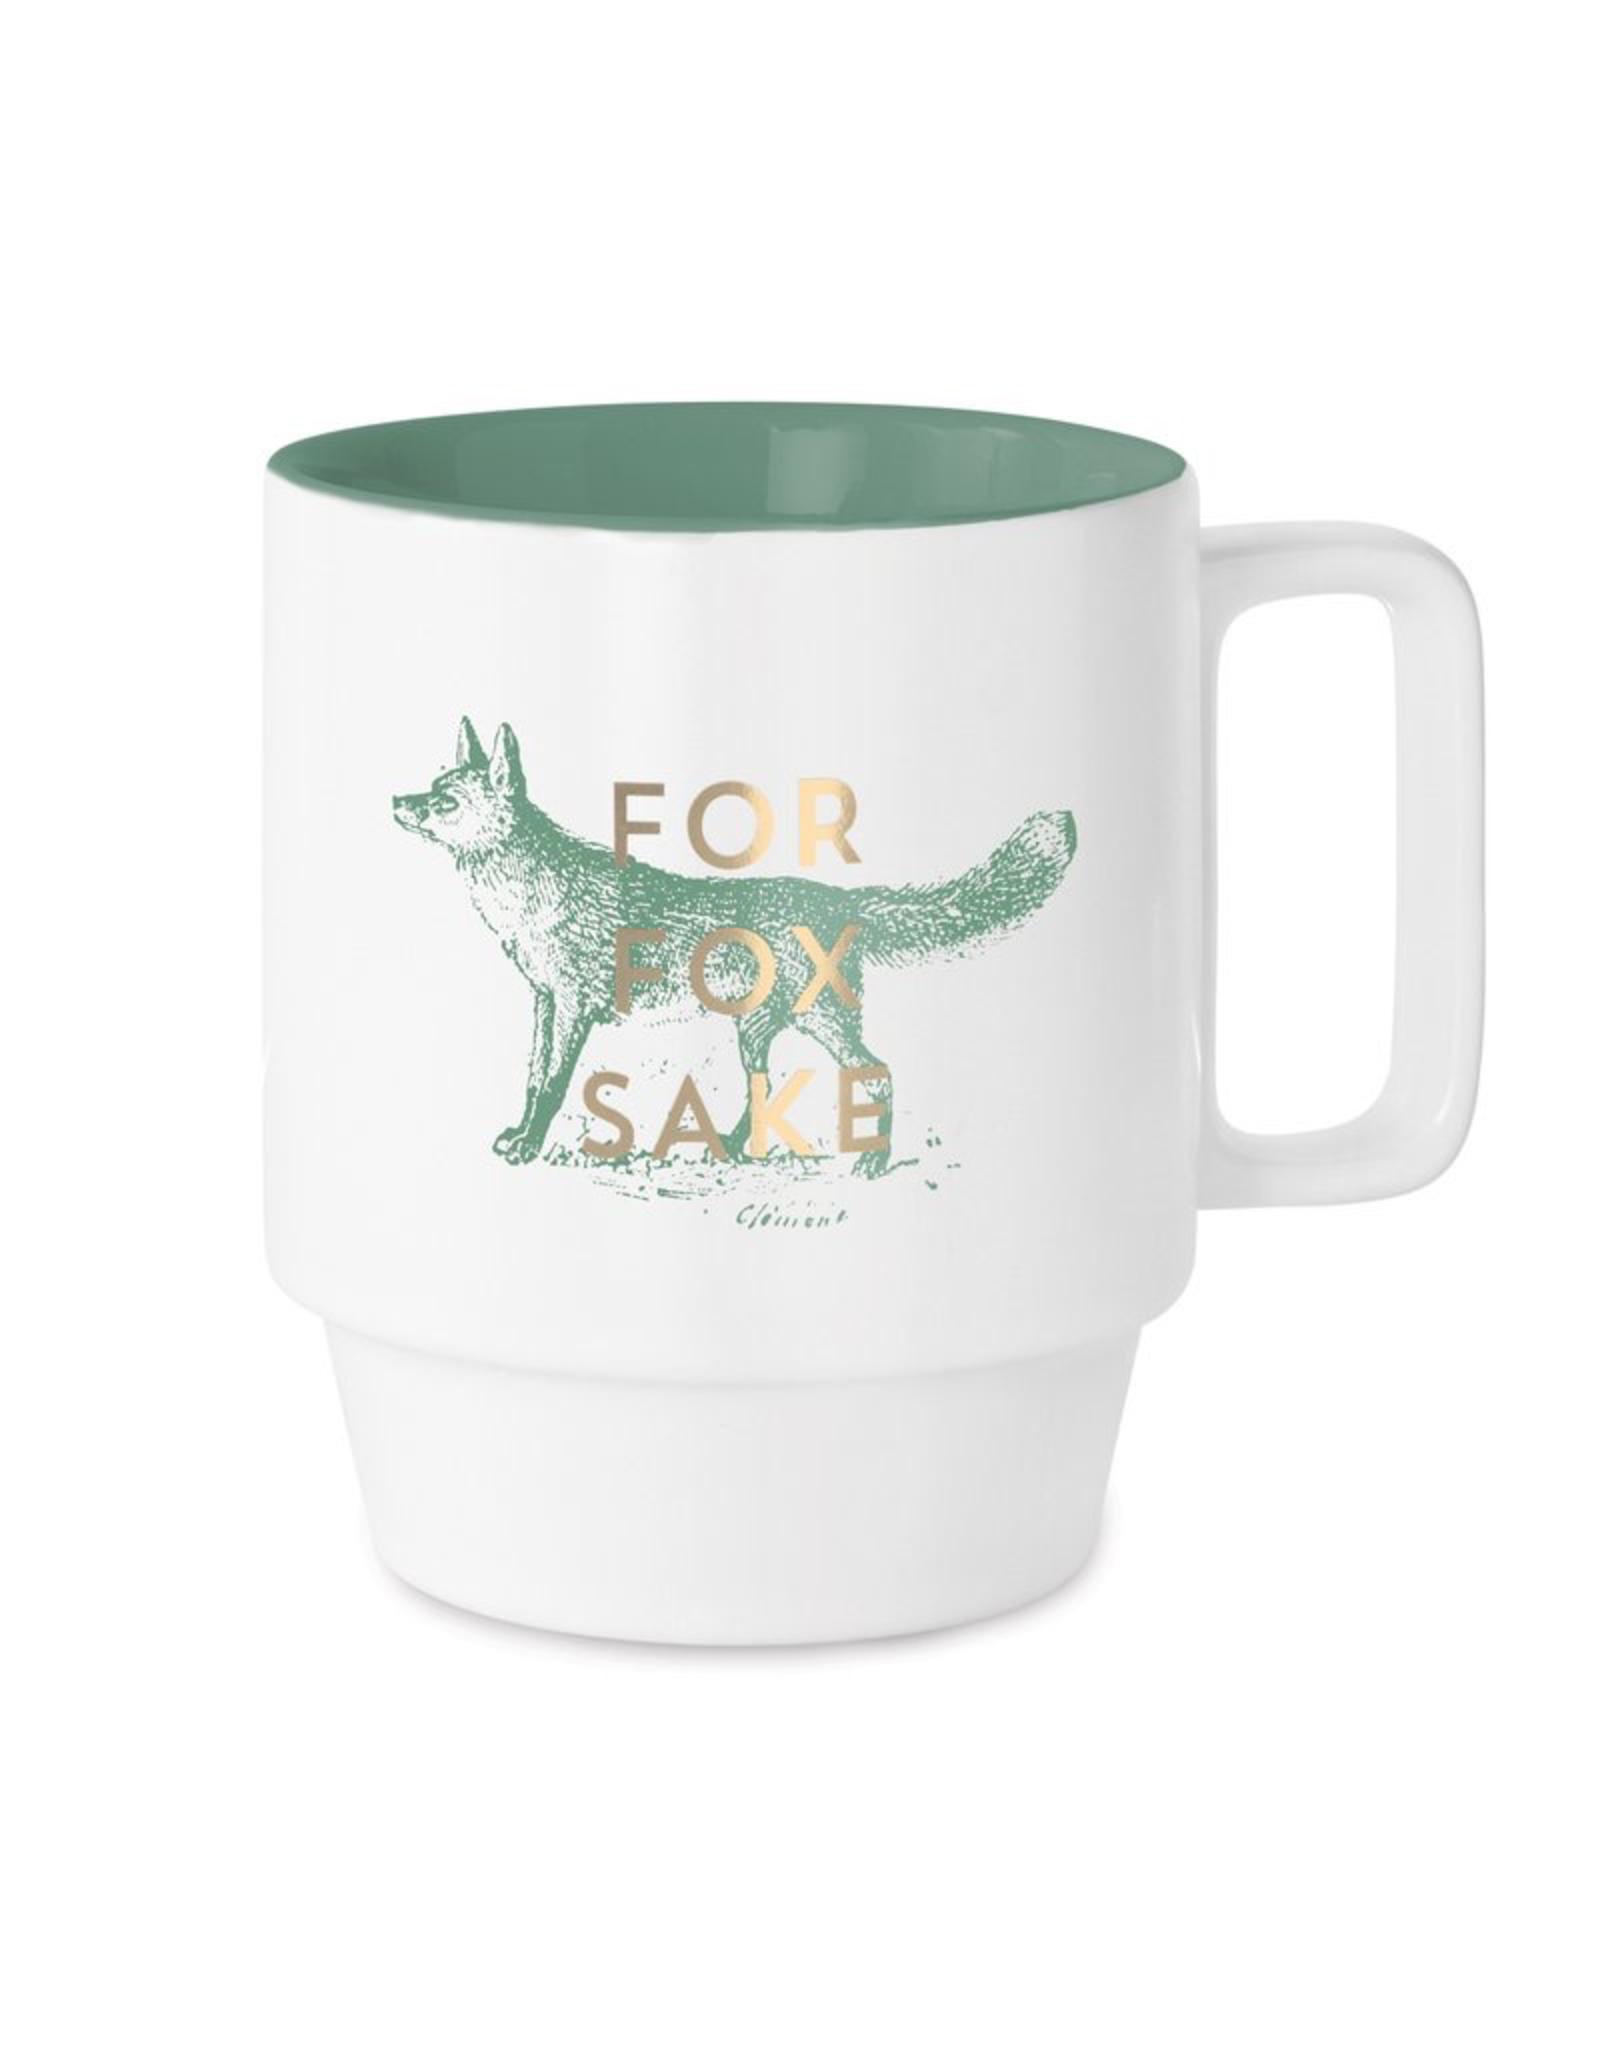 For Fox Sake Mug 12oz.